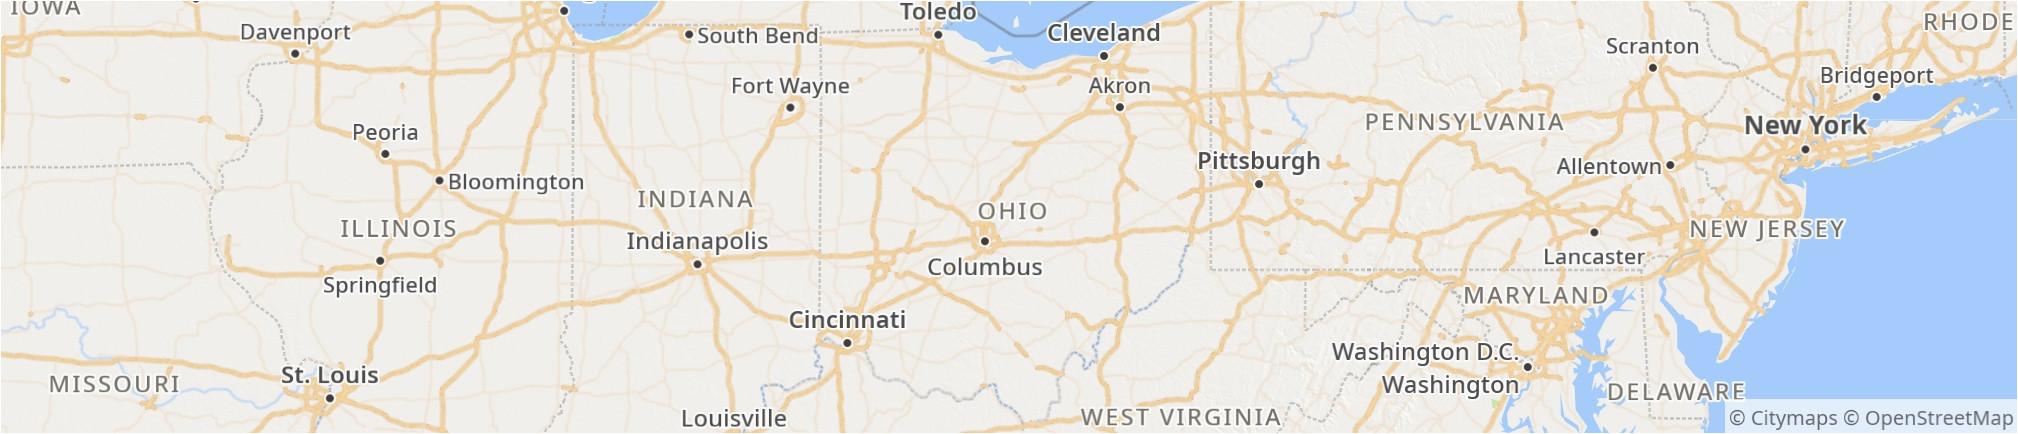 ohio 2019 best of ohio tourism tripadvisor